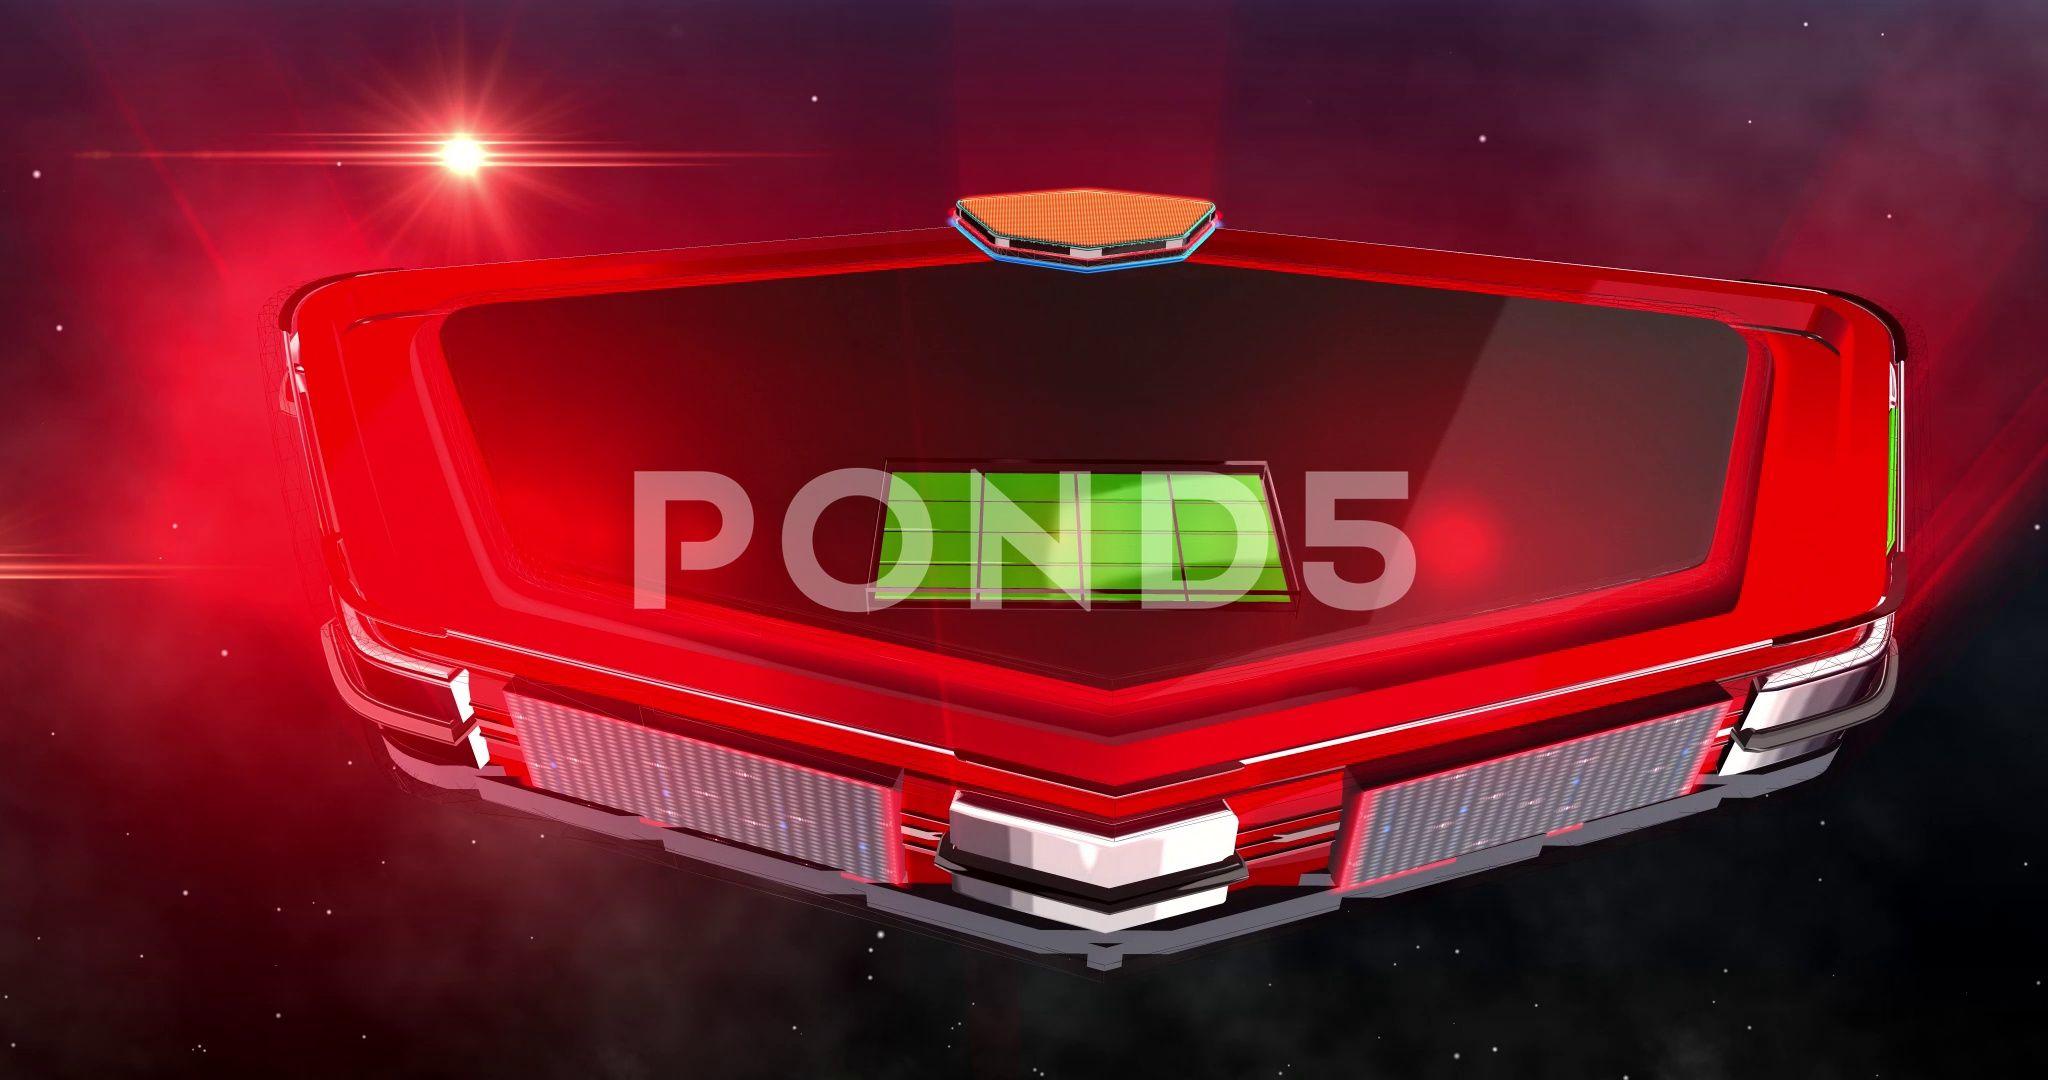 Virtual Motion Green Screen Red Shield Chroma, Stock